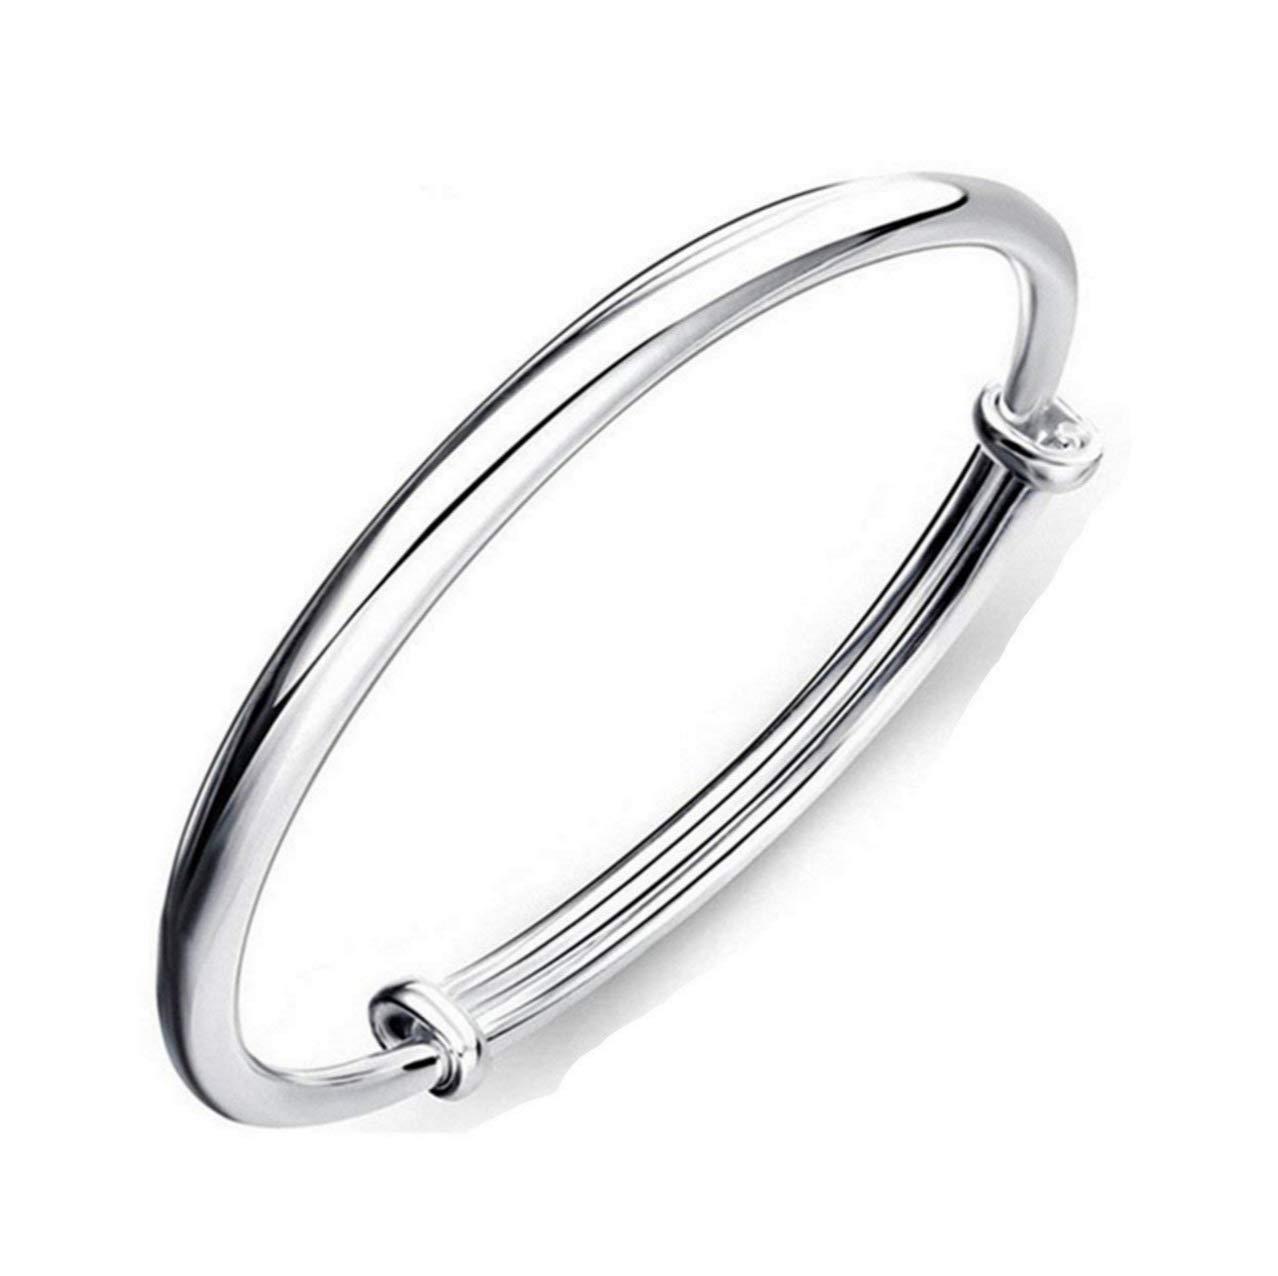 1 X Fashion Women Jewelry Solid 925 Sterling Silver Bangle Bracelet Gift